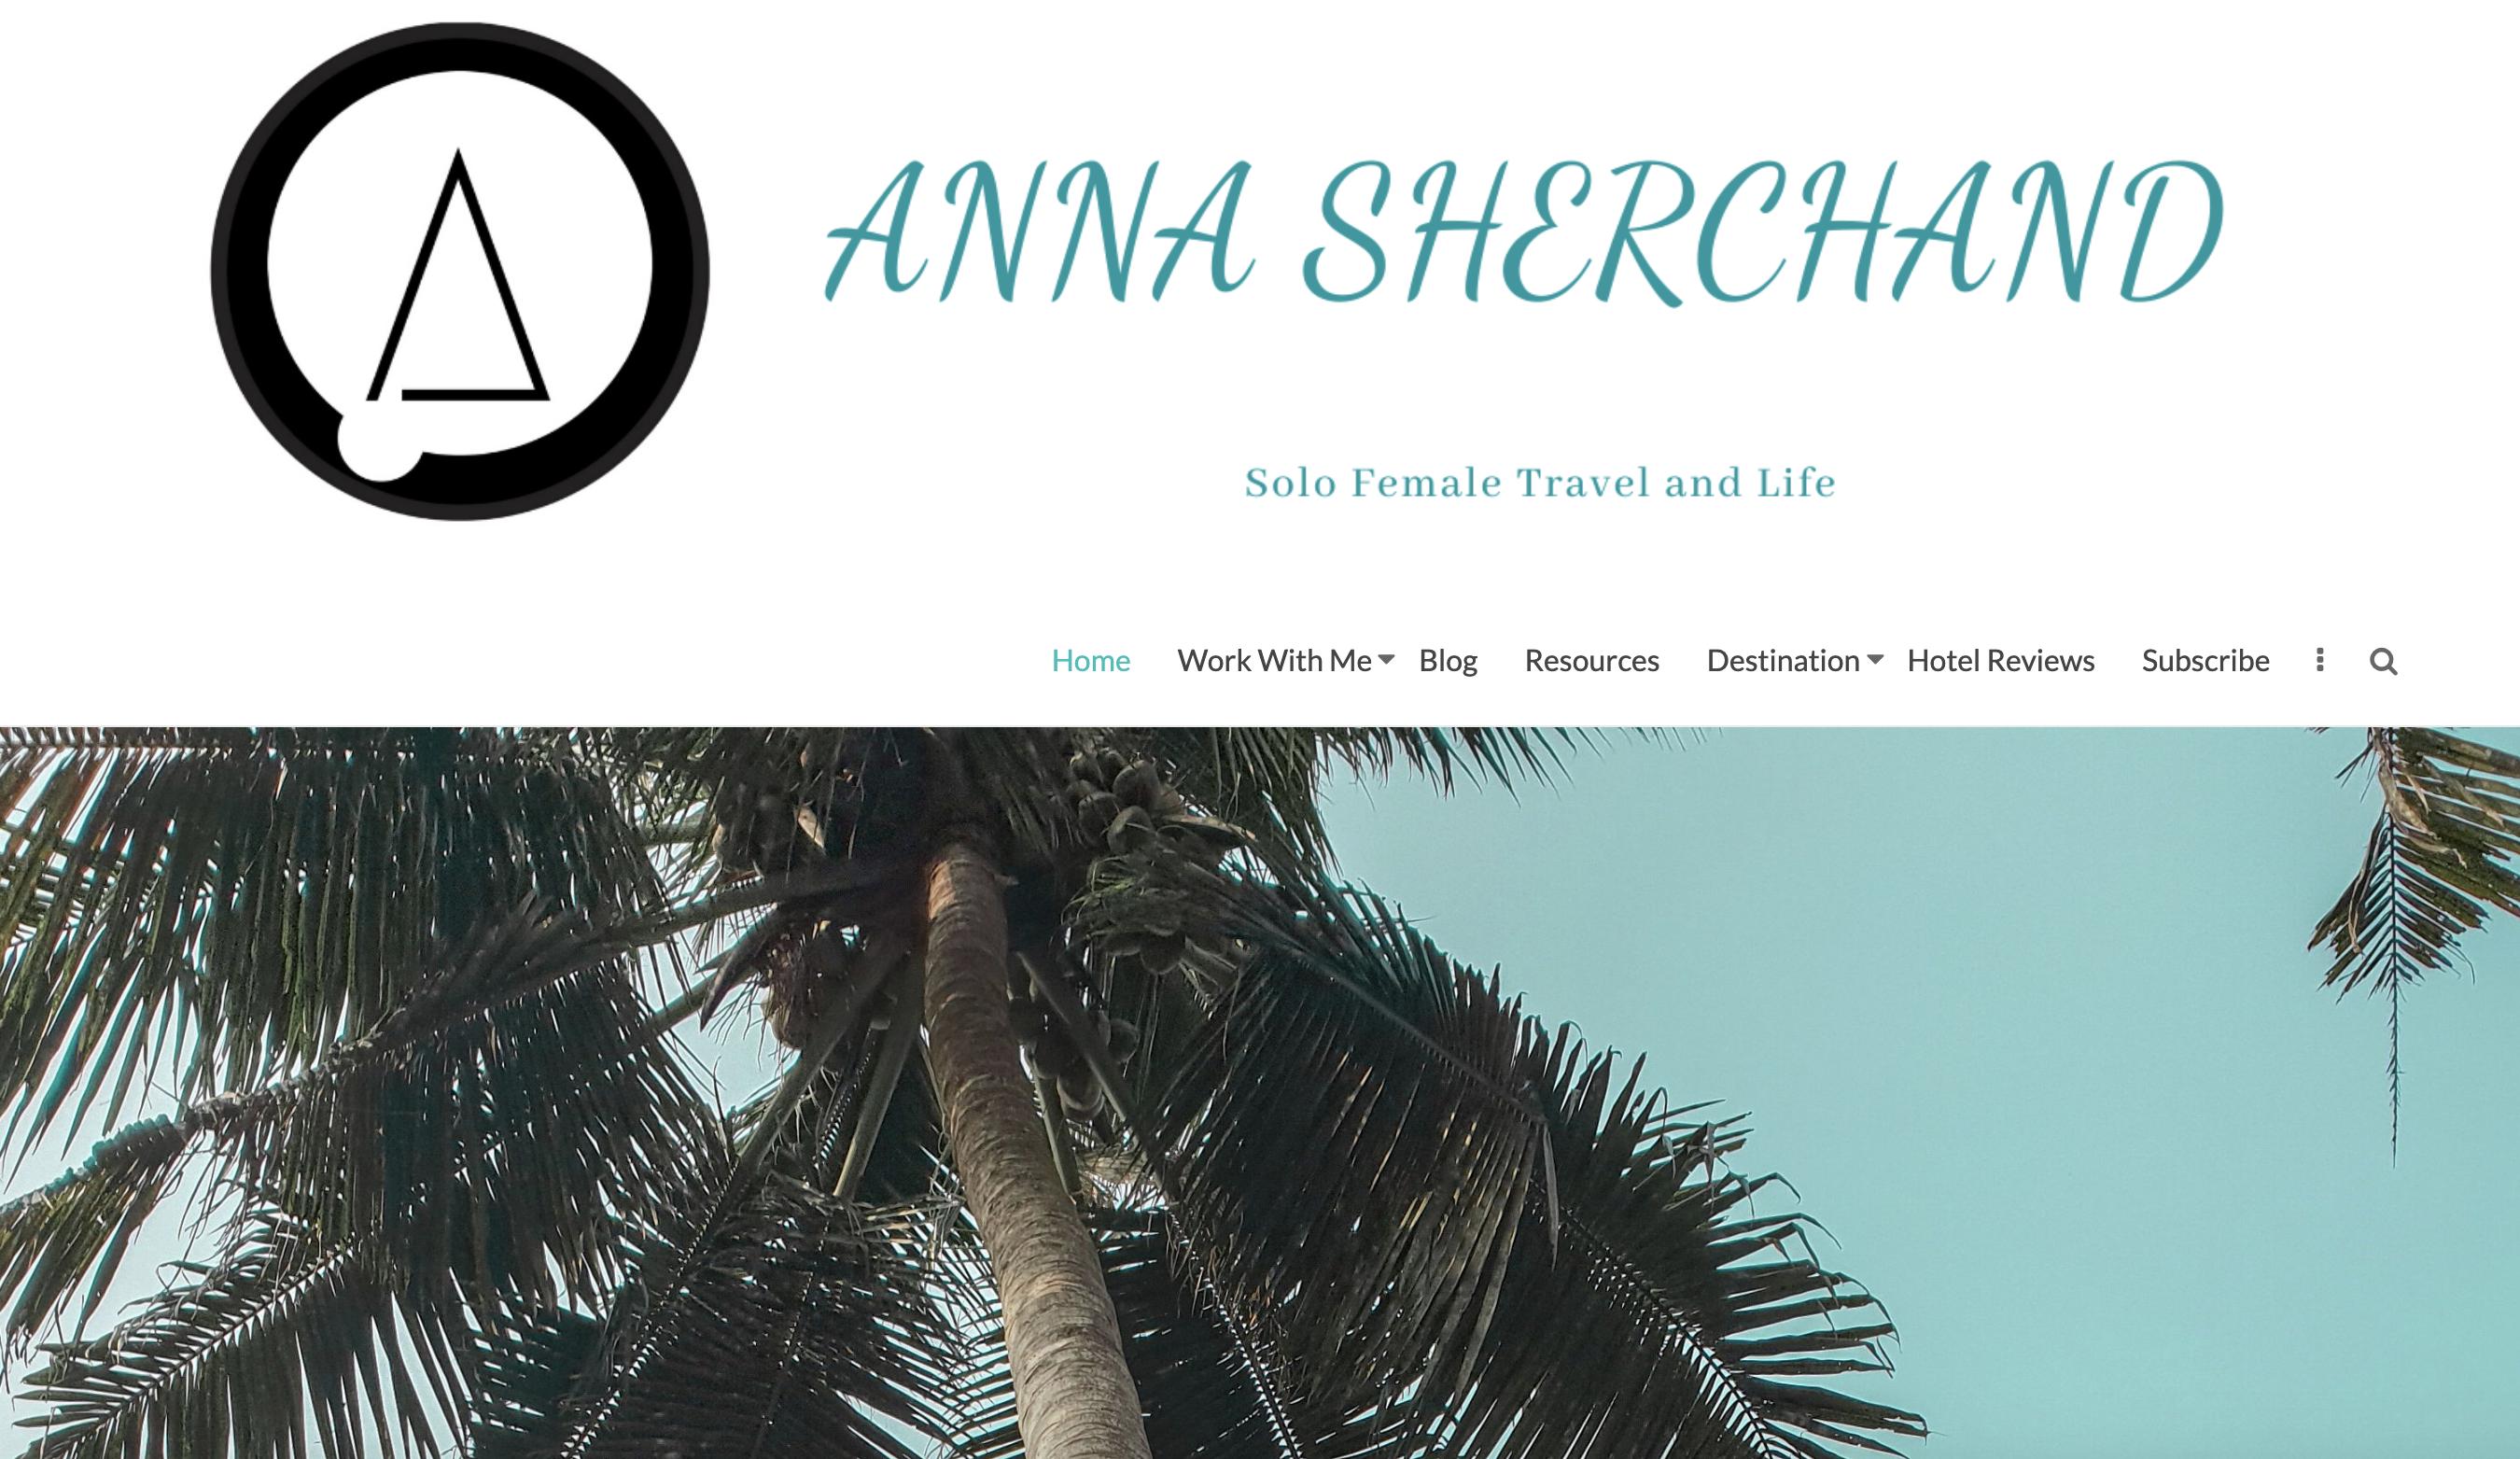 Anna Sherchand